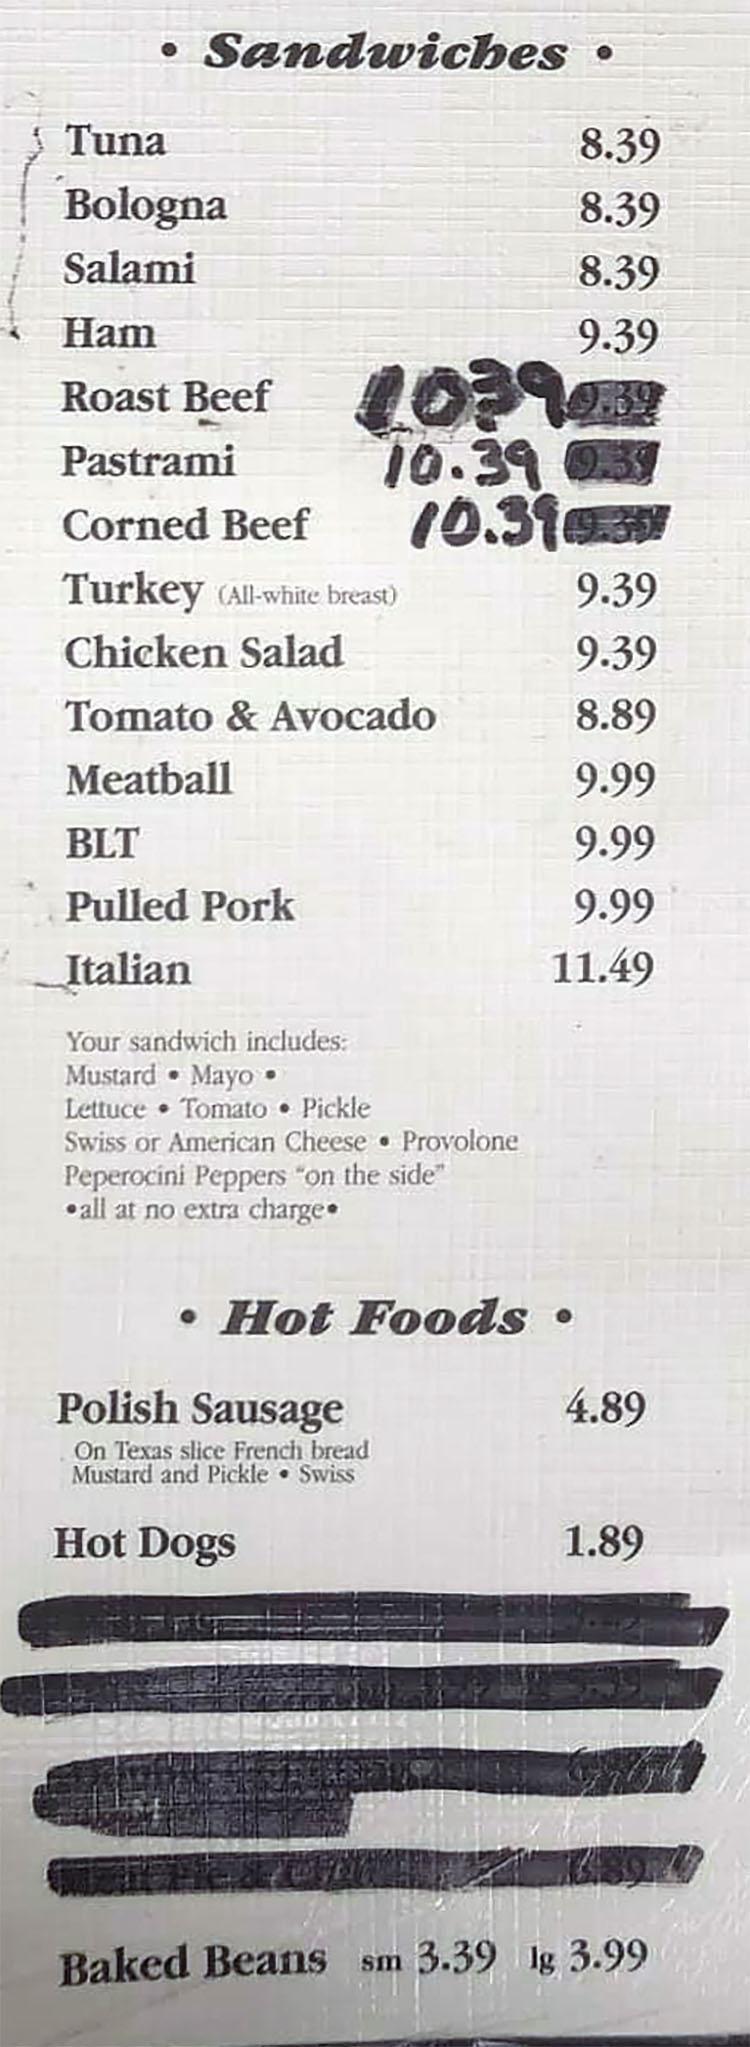 Grove Market & Deli menu - sandwiches, hot foods